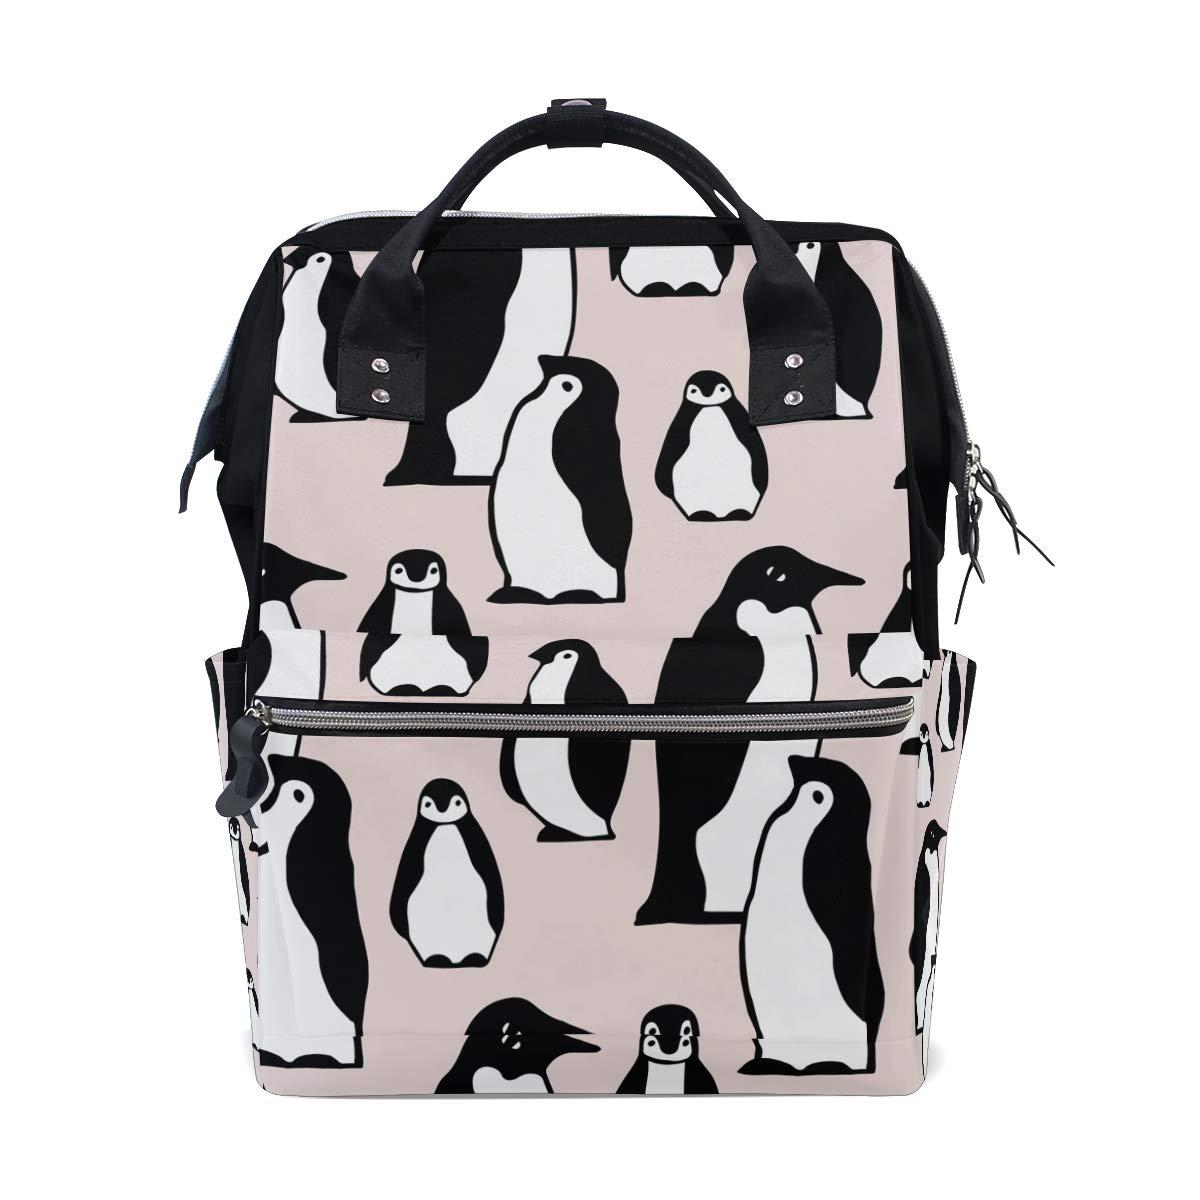 MERRYSUGAR Diaper Bag Backpack Travel Bag Large Multifunction Waterproof Cute Cartoon Penguin Pink Animal Stylish and Durable Nappy Bag for Baby Care School Backpack